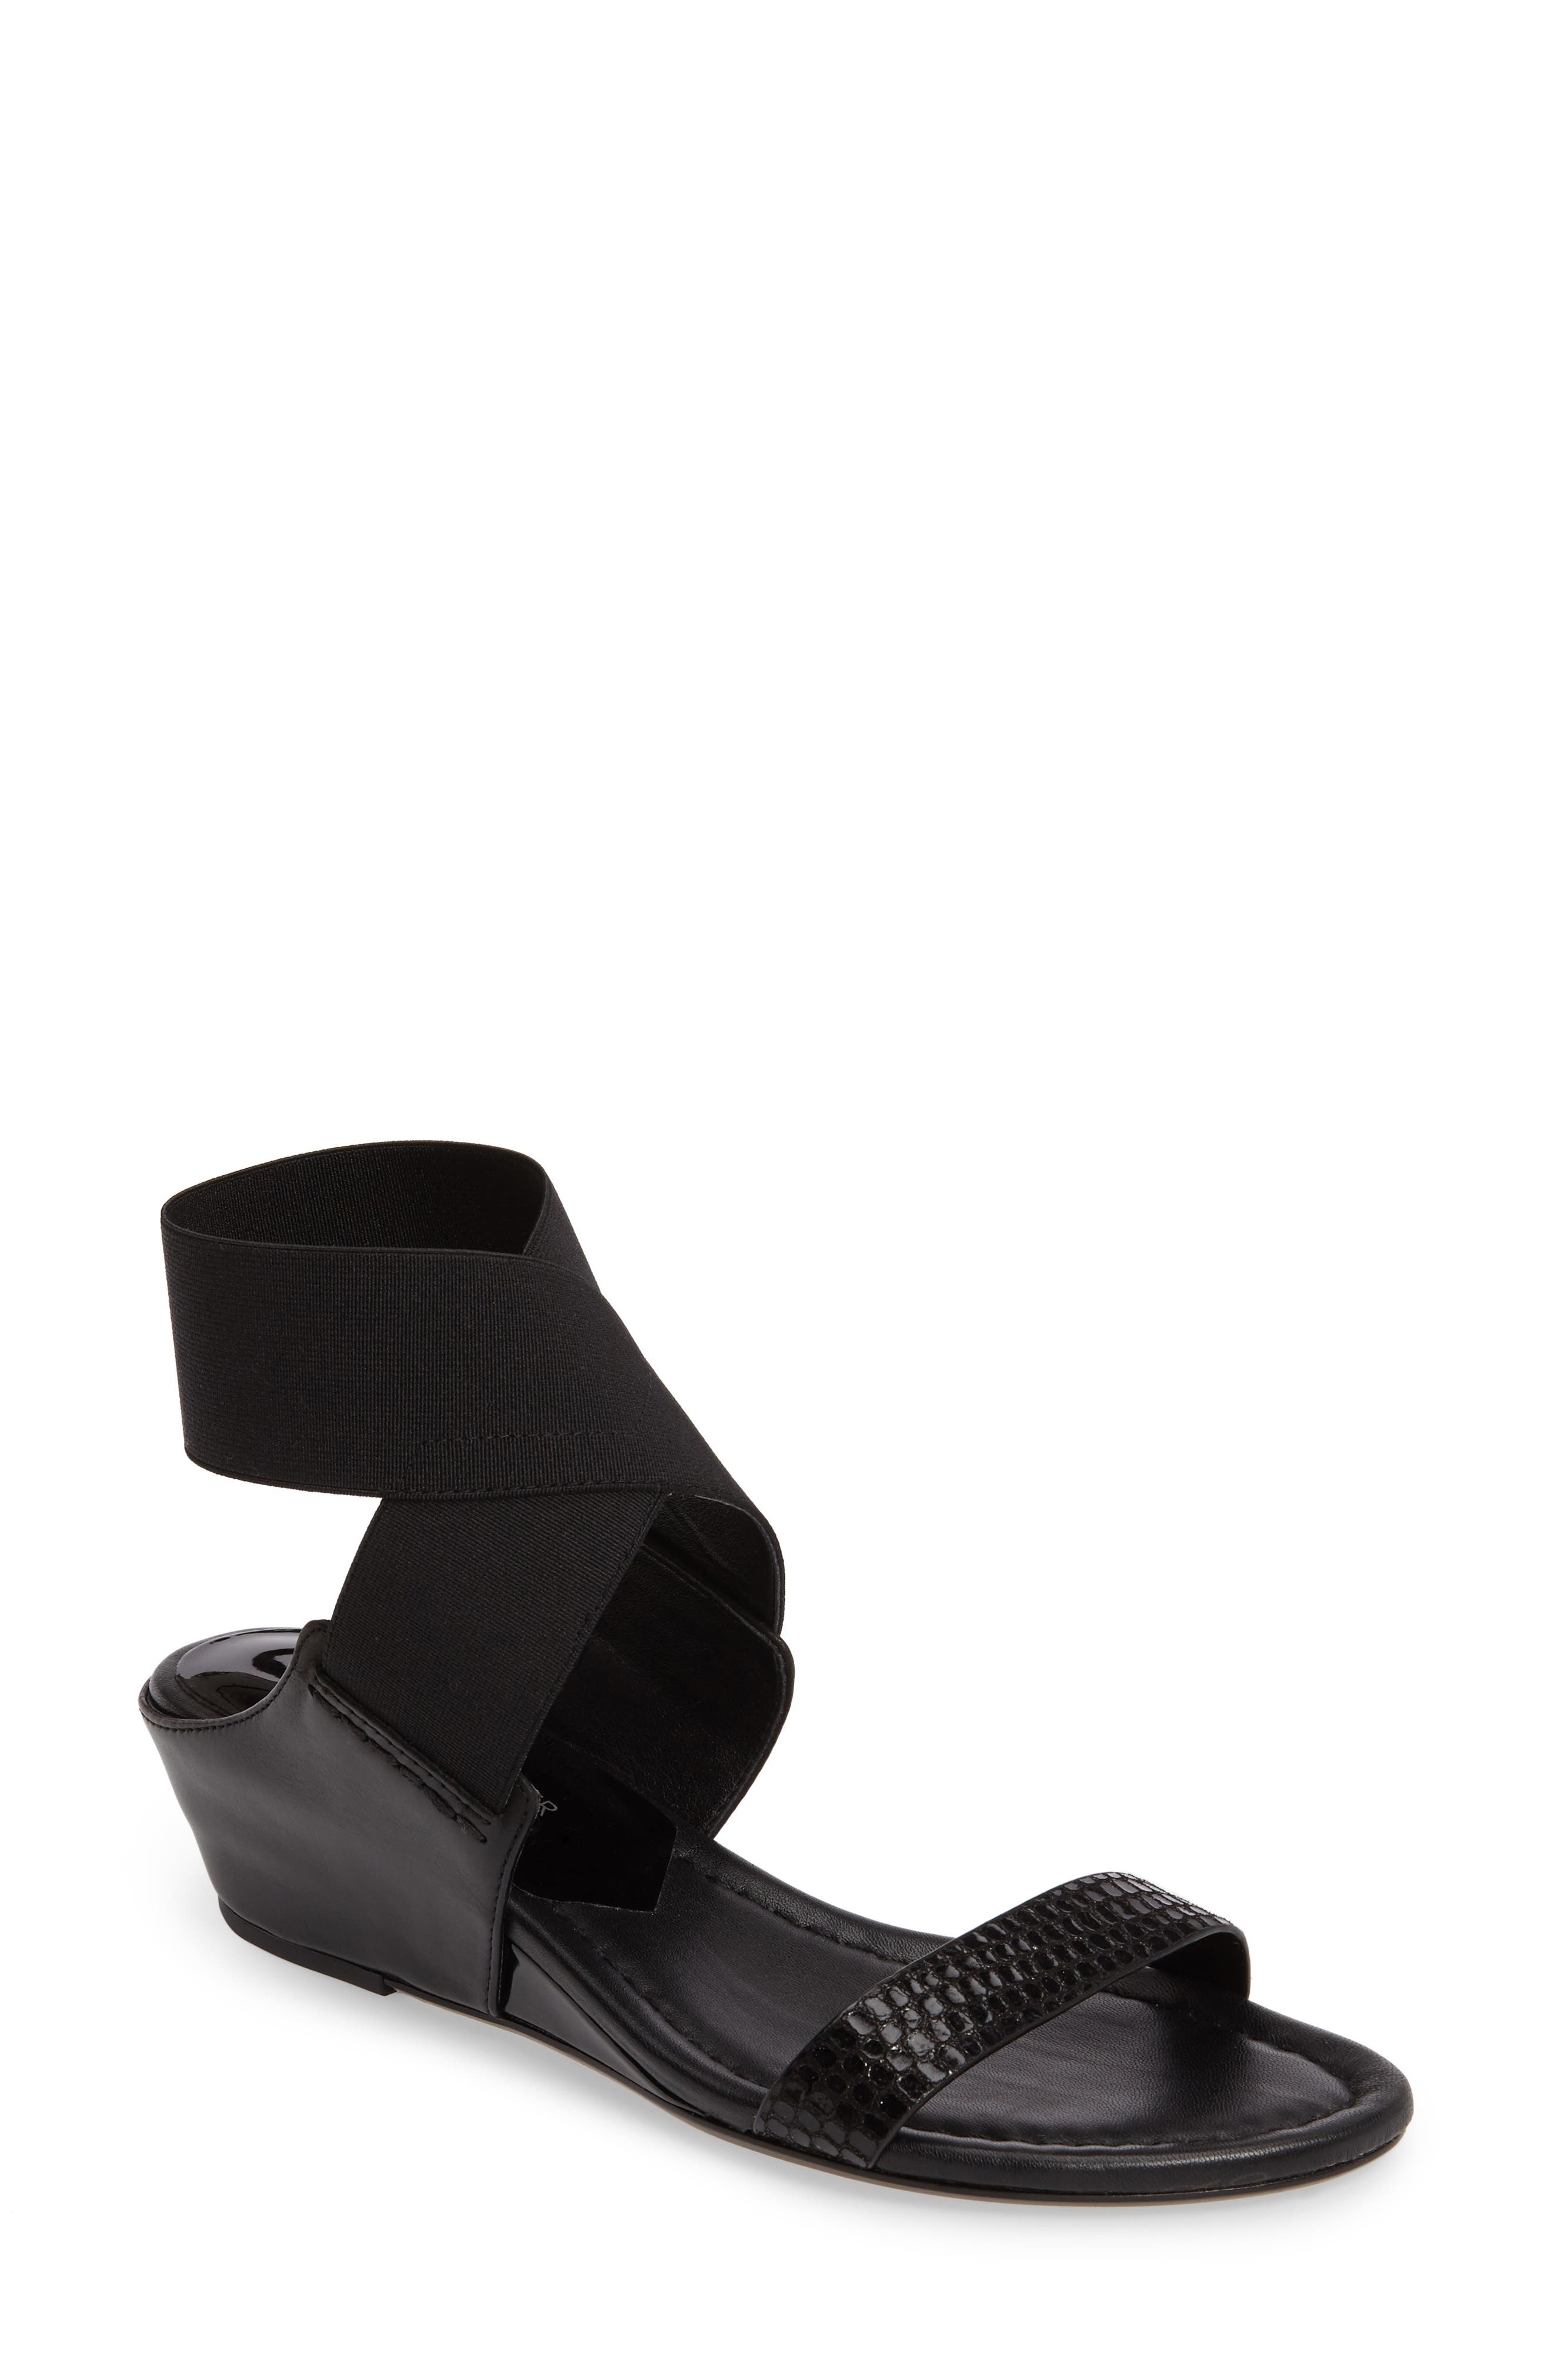 Donald J Pliner Eeva Wedge Sandal,                         Main,                         color, 002